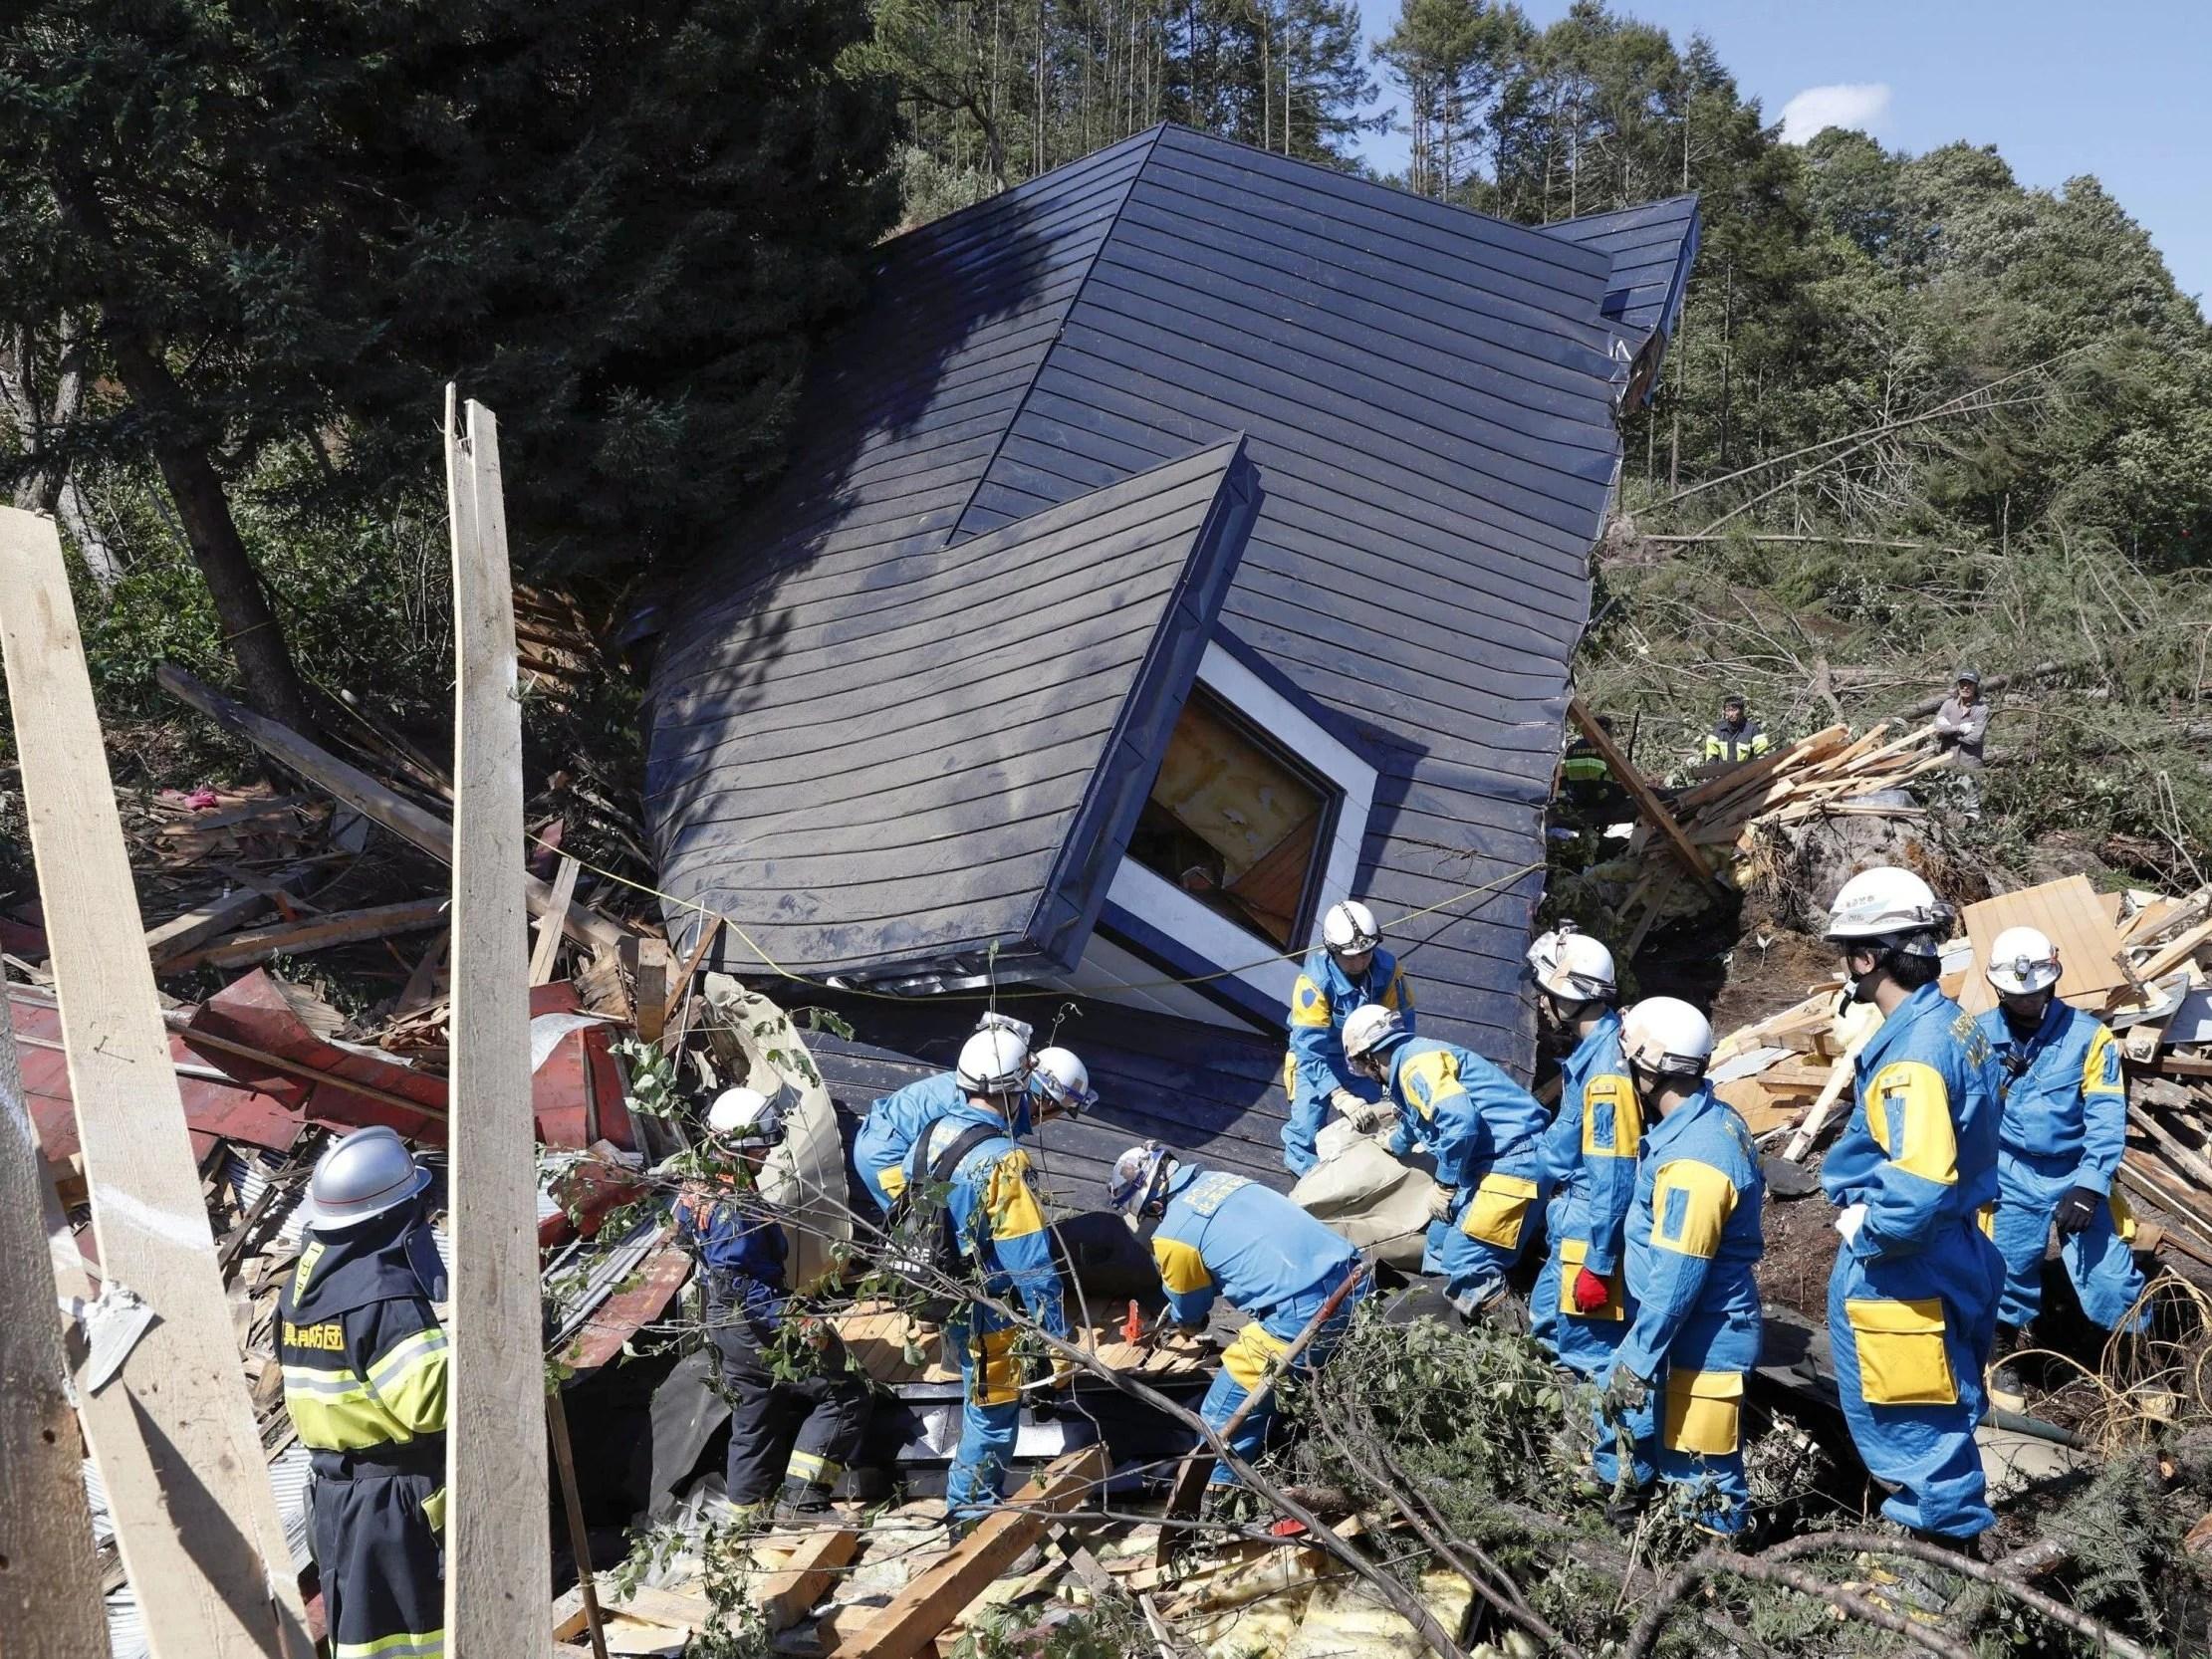 Japan Earthquake At Least 8 Dead As Powerful Quake Hits Northern Island Of Hokkaido